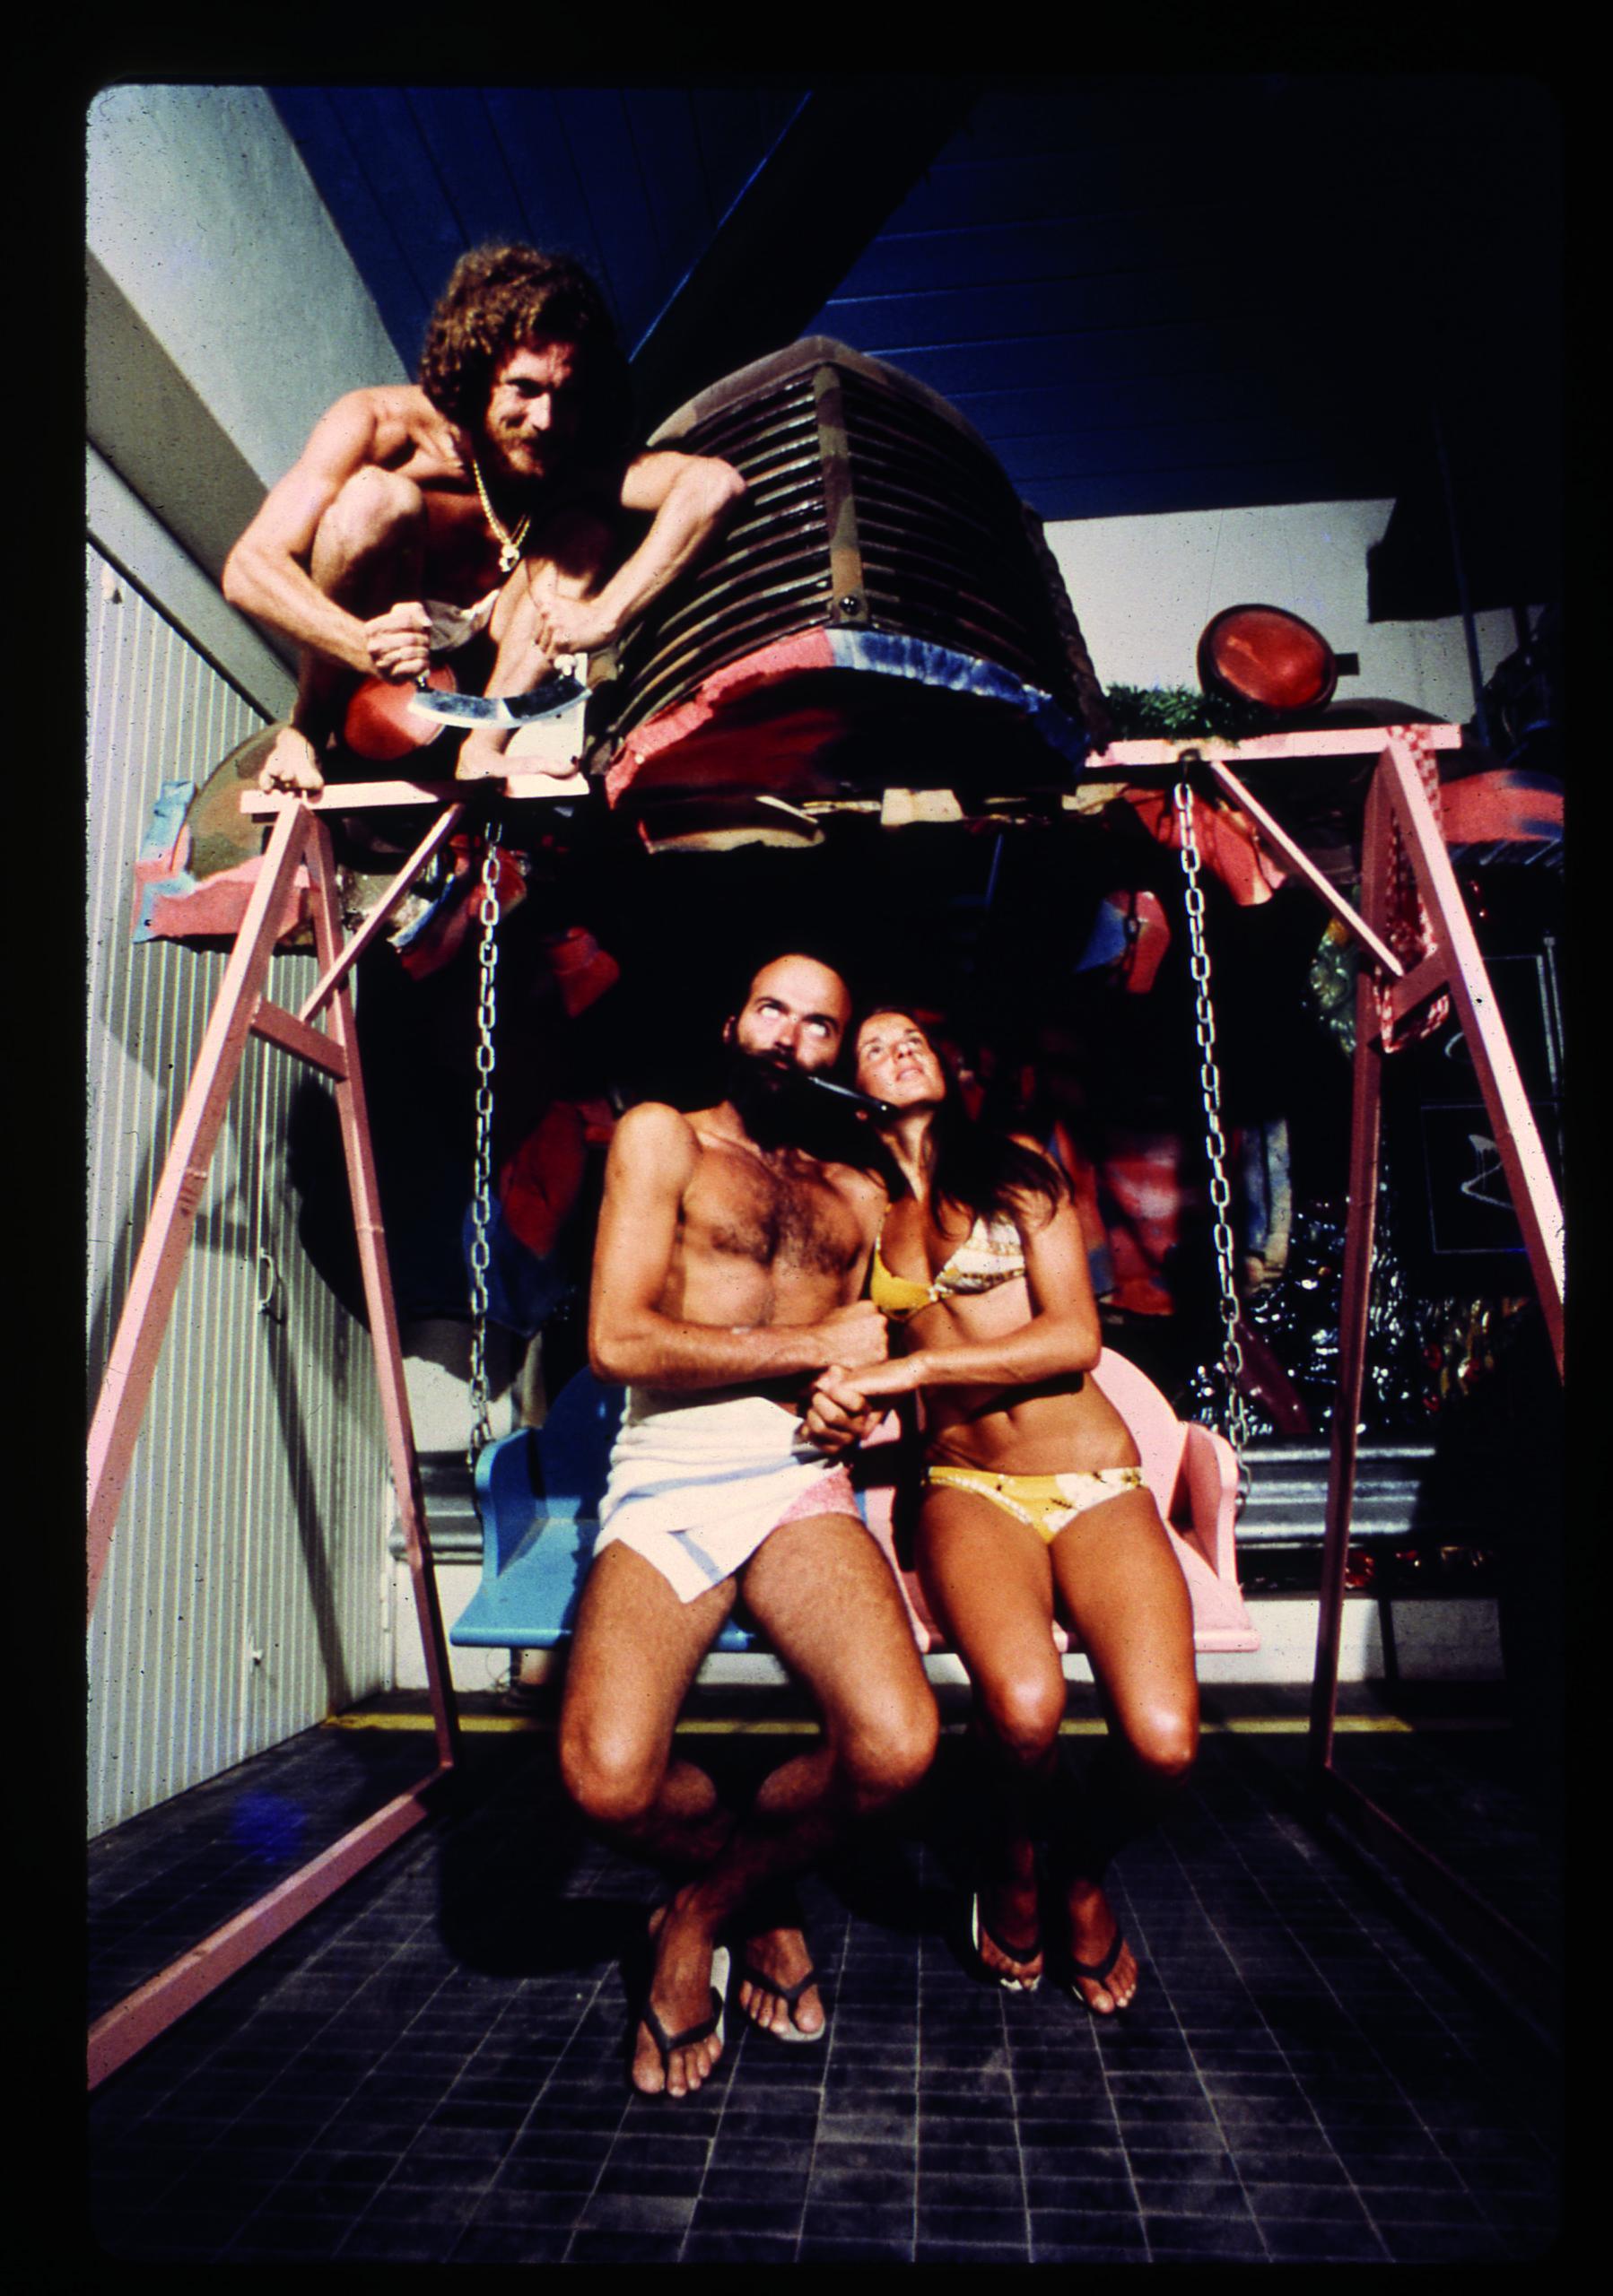 UFO, lovers on a swing chair, Bamba Issa, Forte dei Marmi, 1970. Photograph by Carlo Bachi, © Lapo Binazzi, UFO Archive